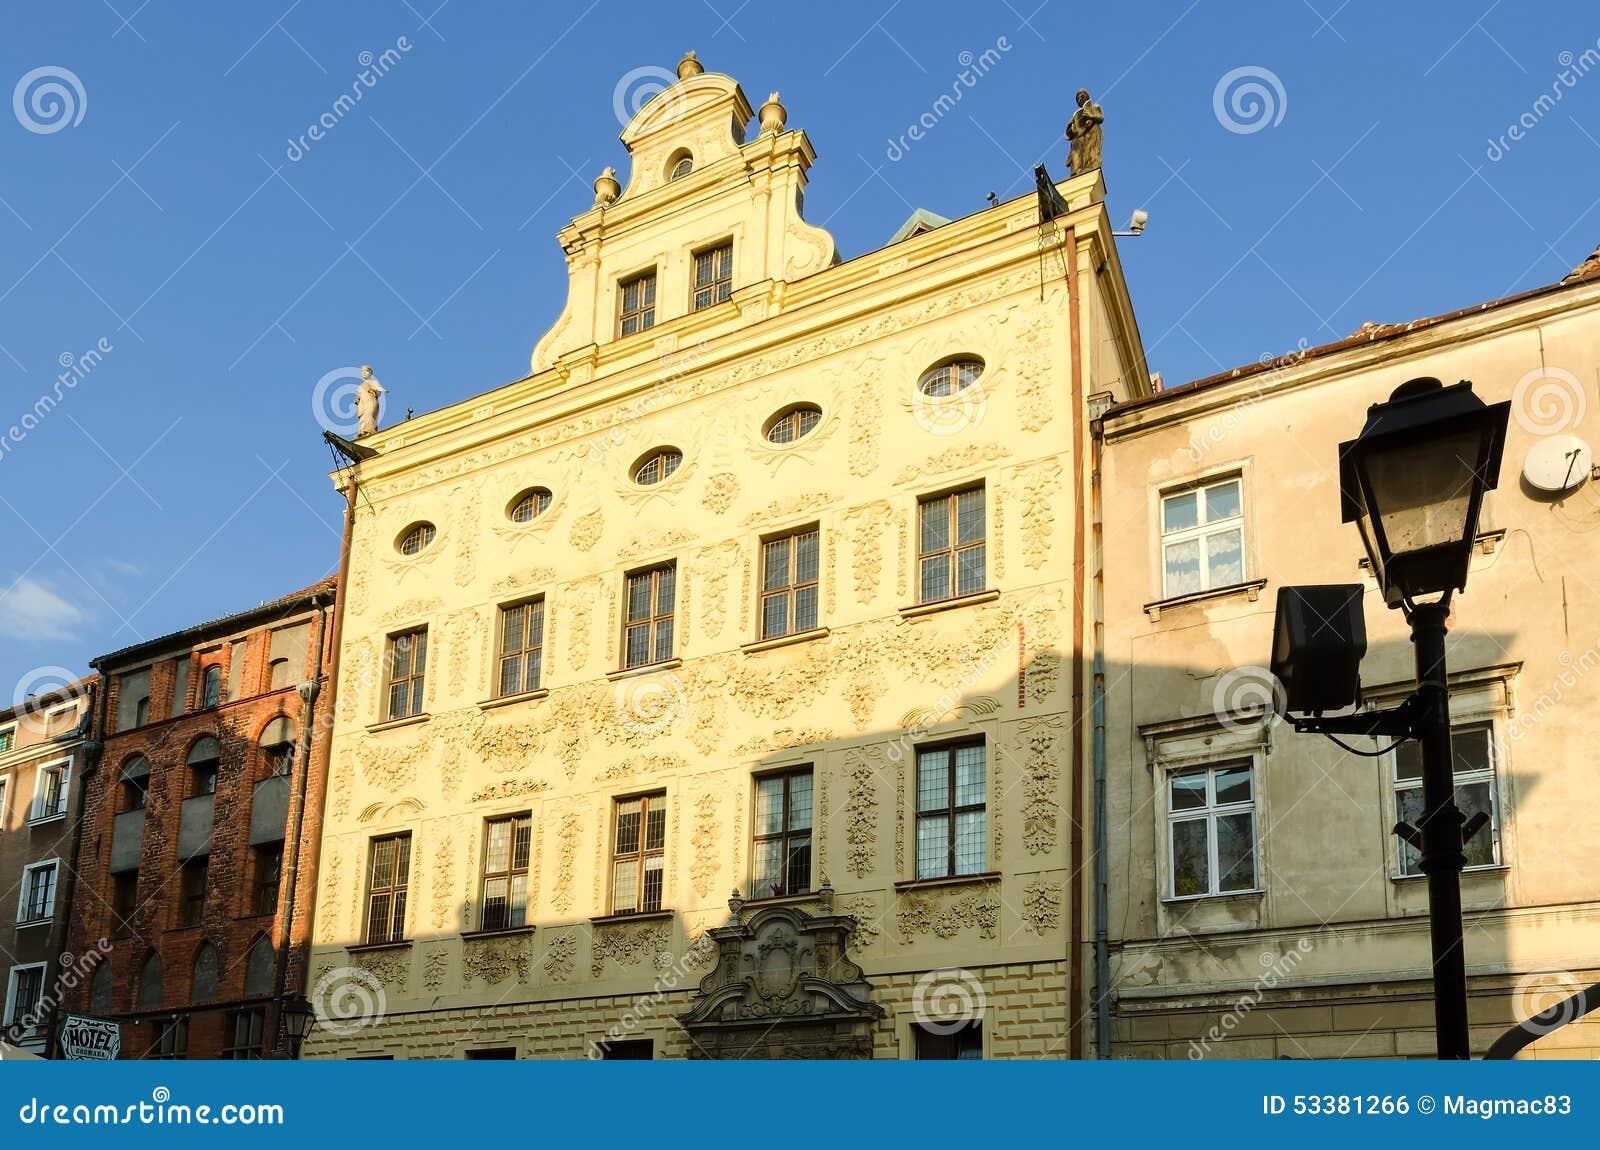 Old Town Hall in Torun, Poland.